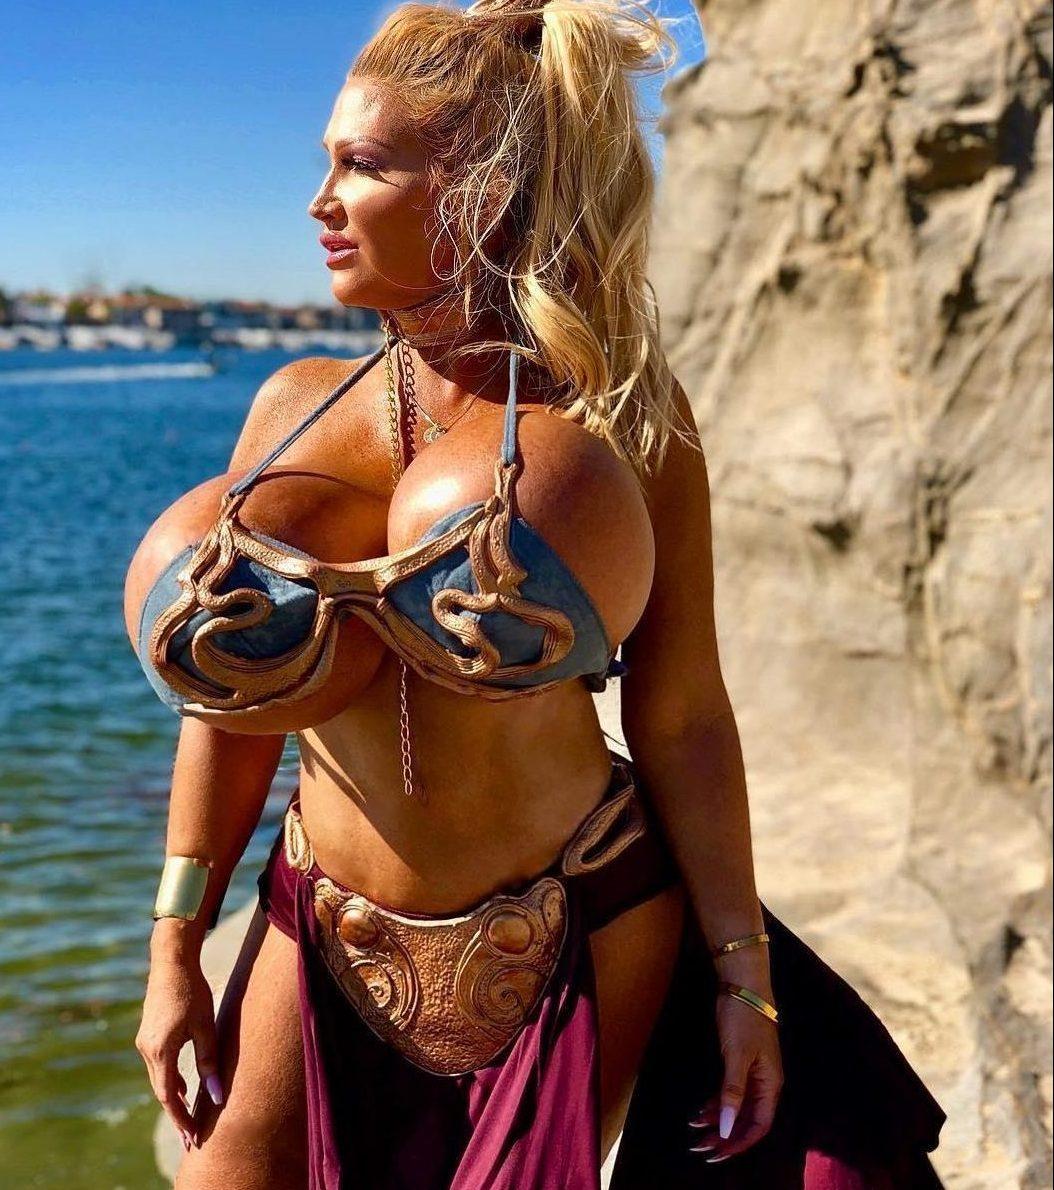 Allegracole Instagram Nude photo 13